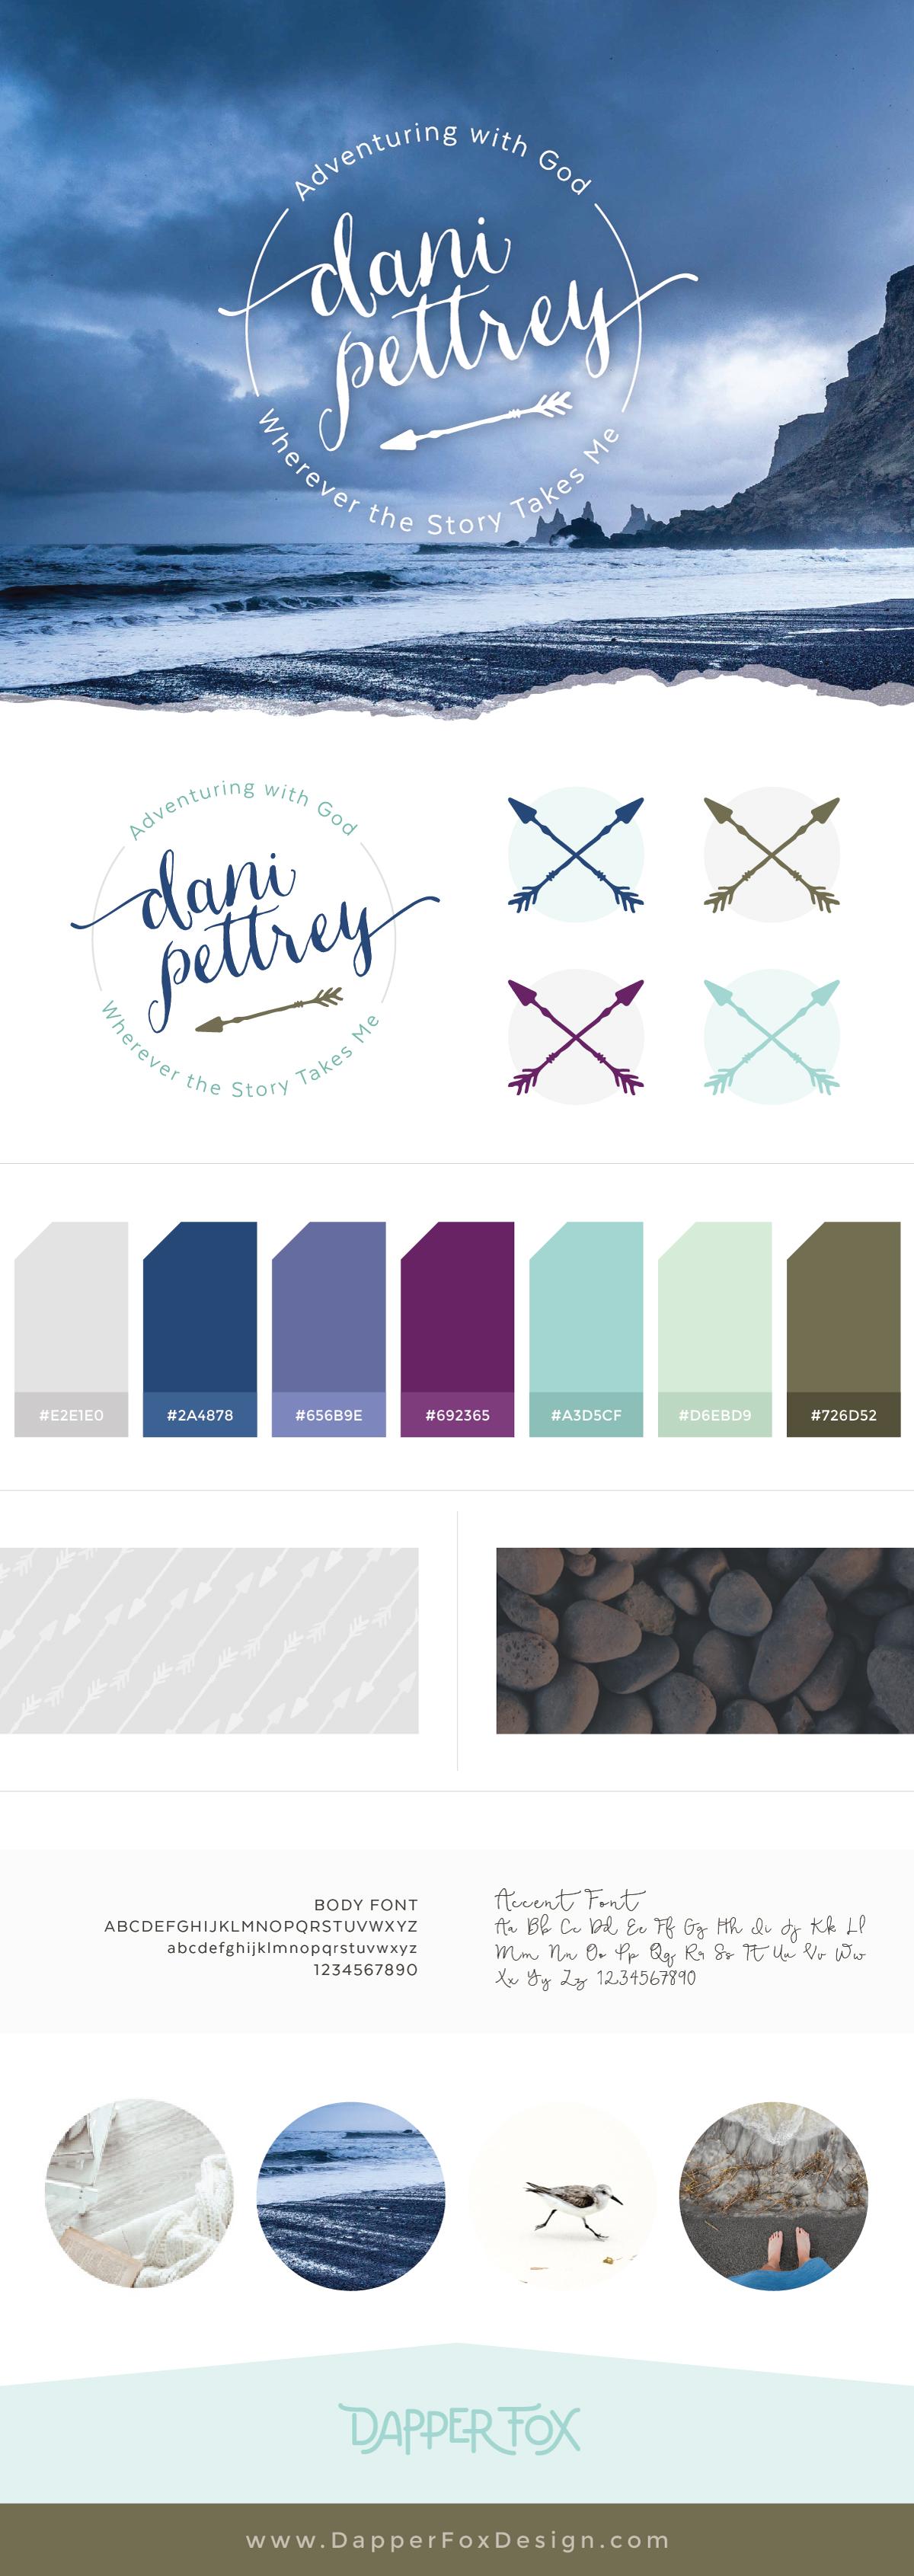 Author Dani Pettrey Brand Logo Design and   Branding #Coastal #Beach #Ocean #Design #Modern Script Font Logo #arrows